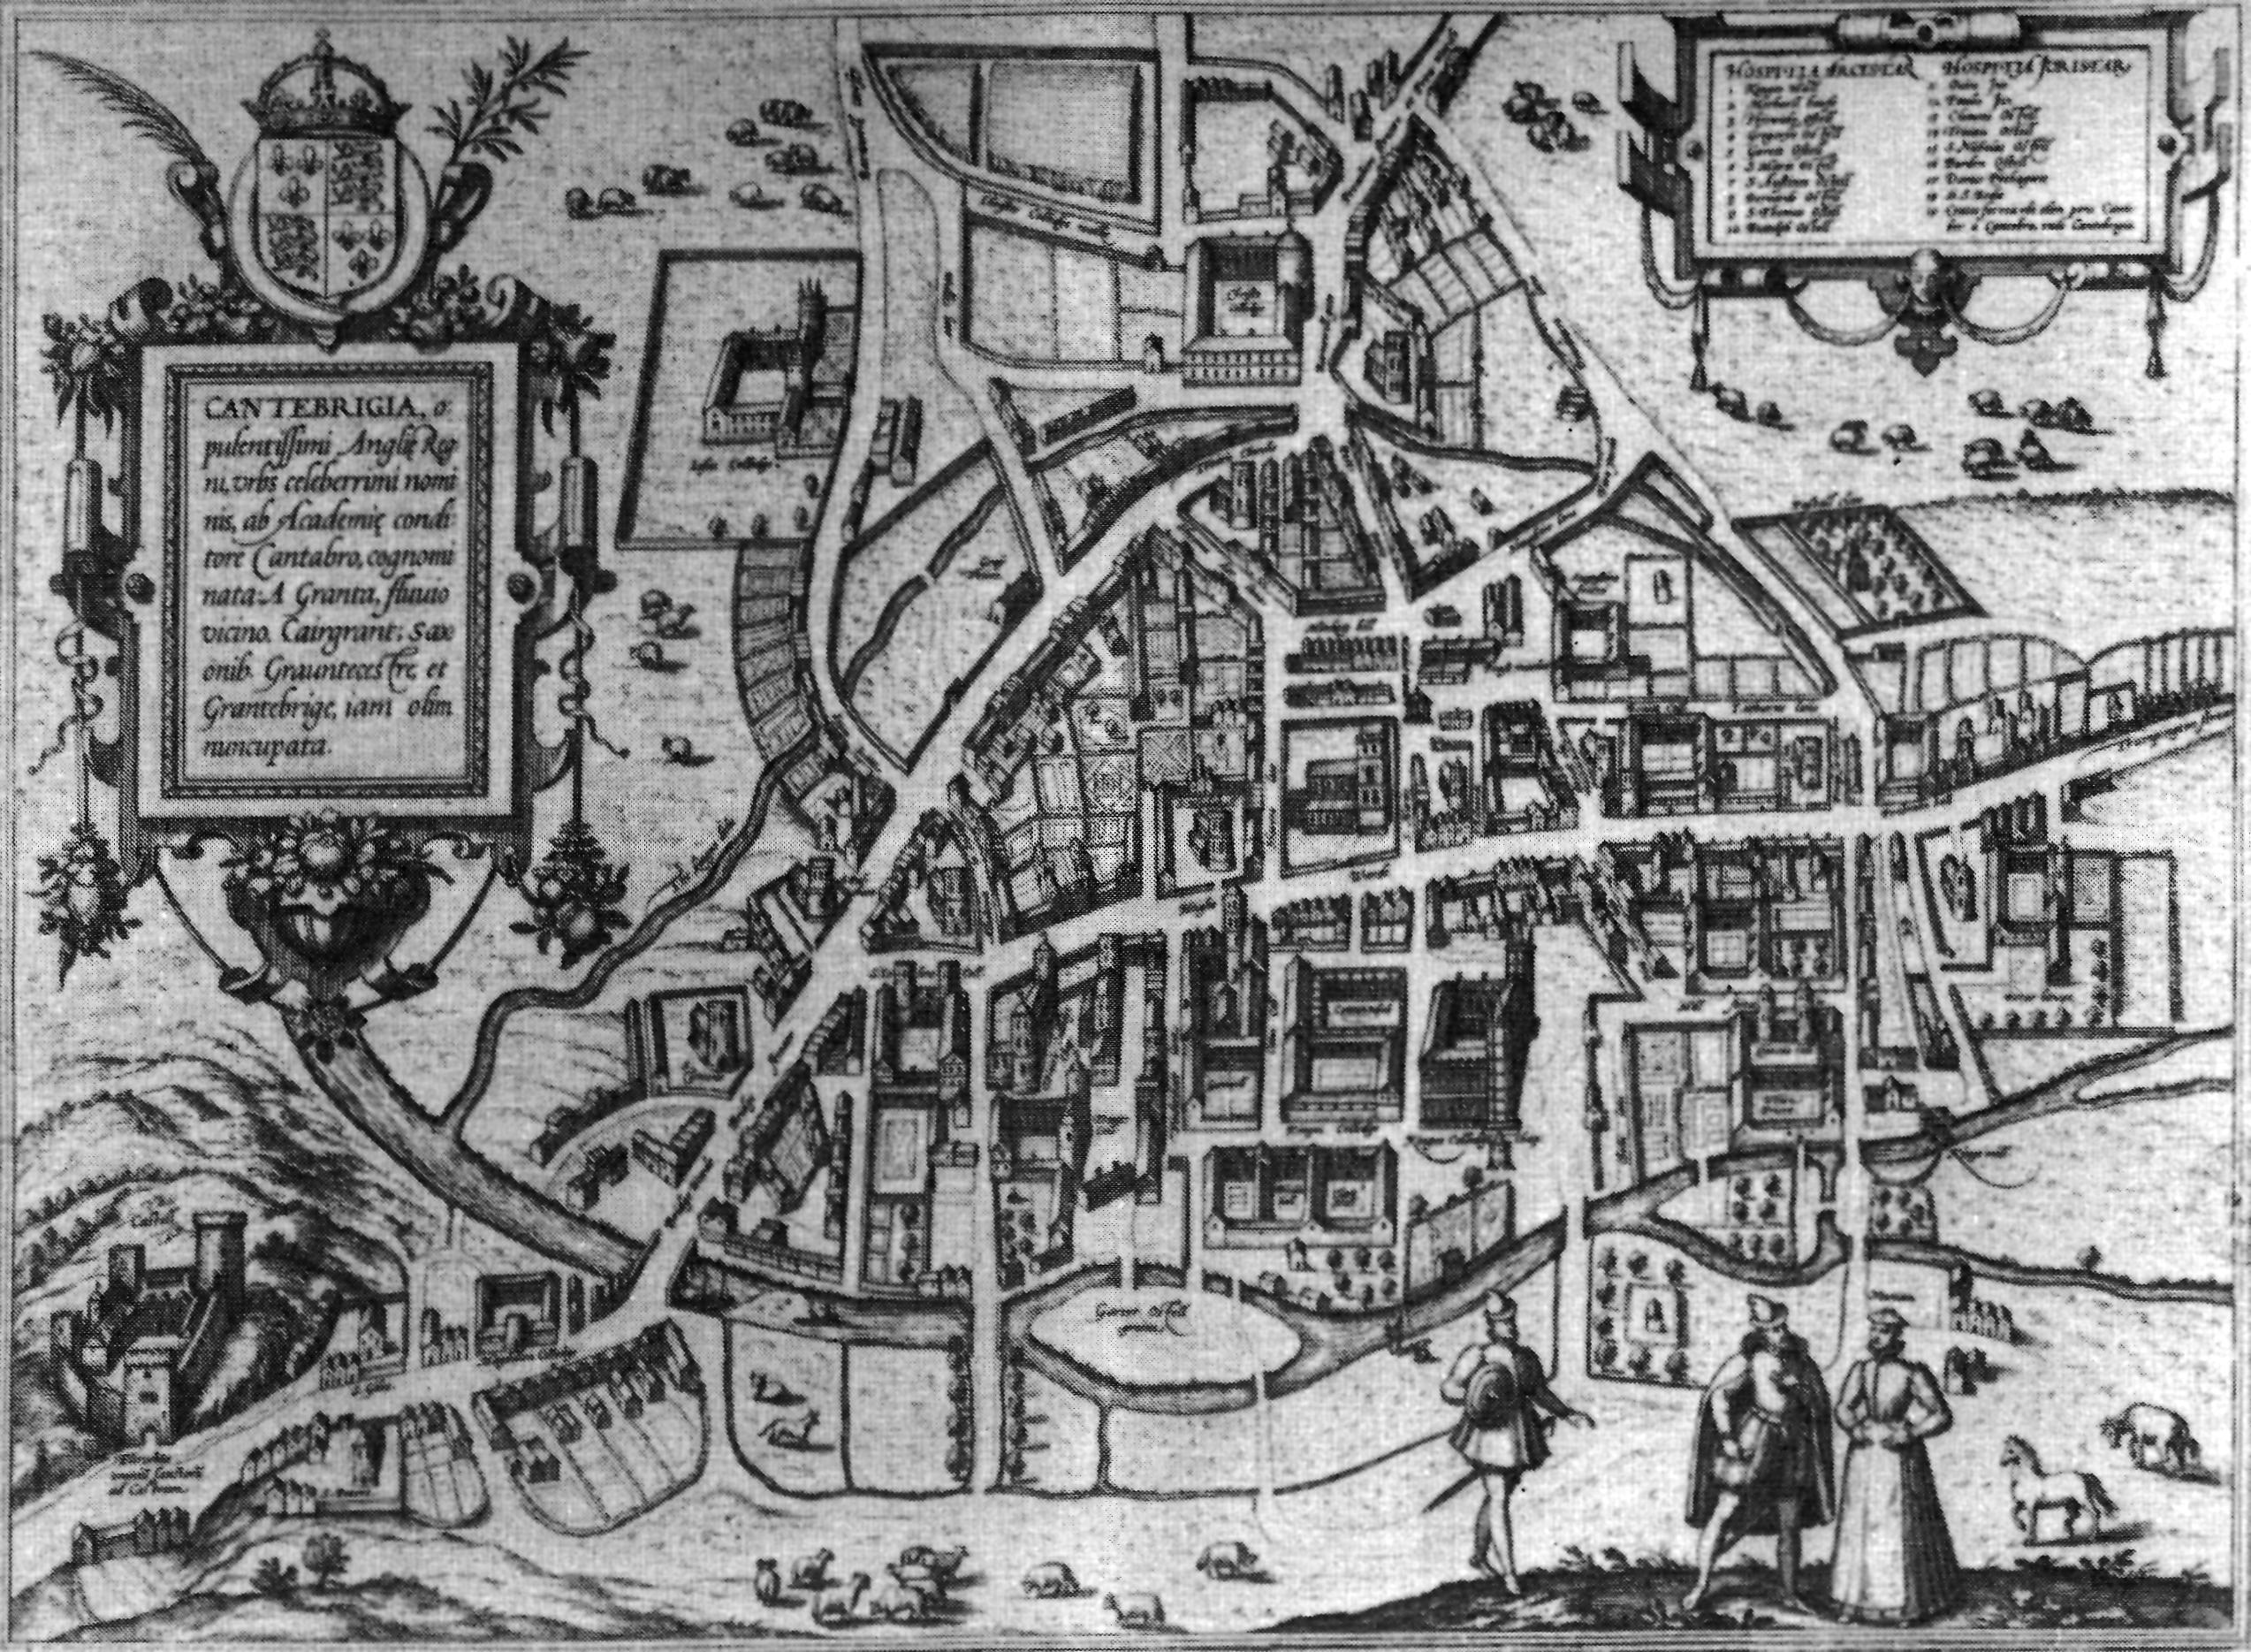 File:Cambridge 1575.png